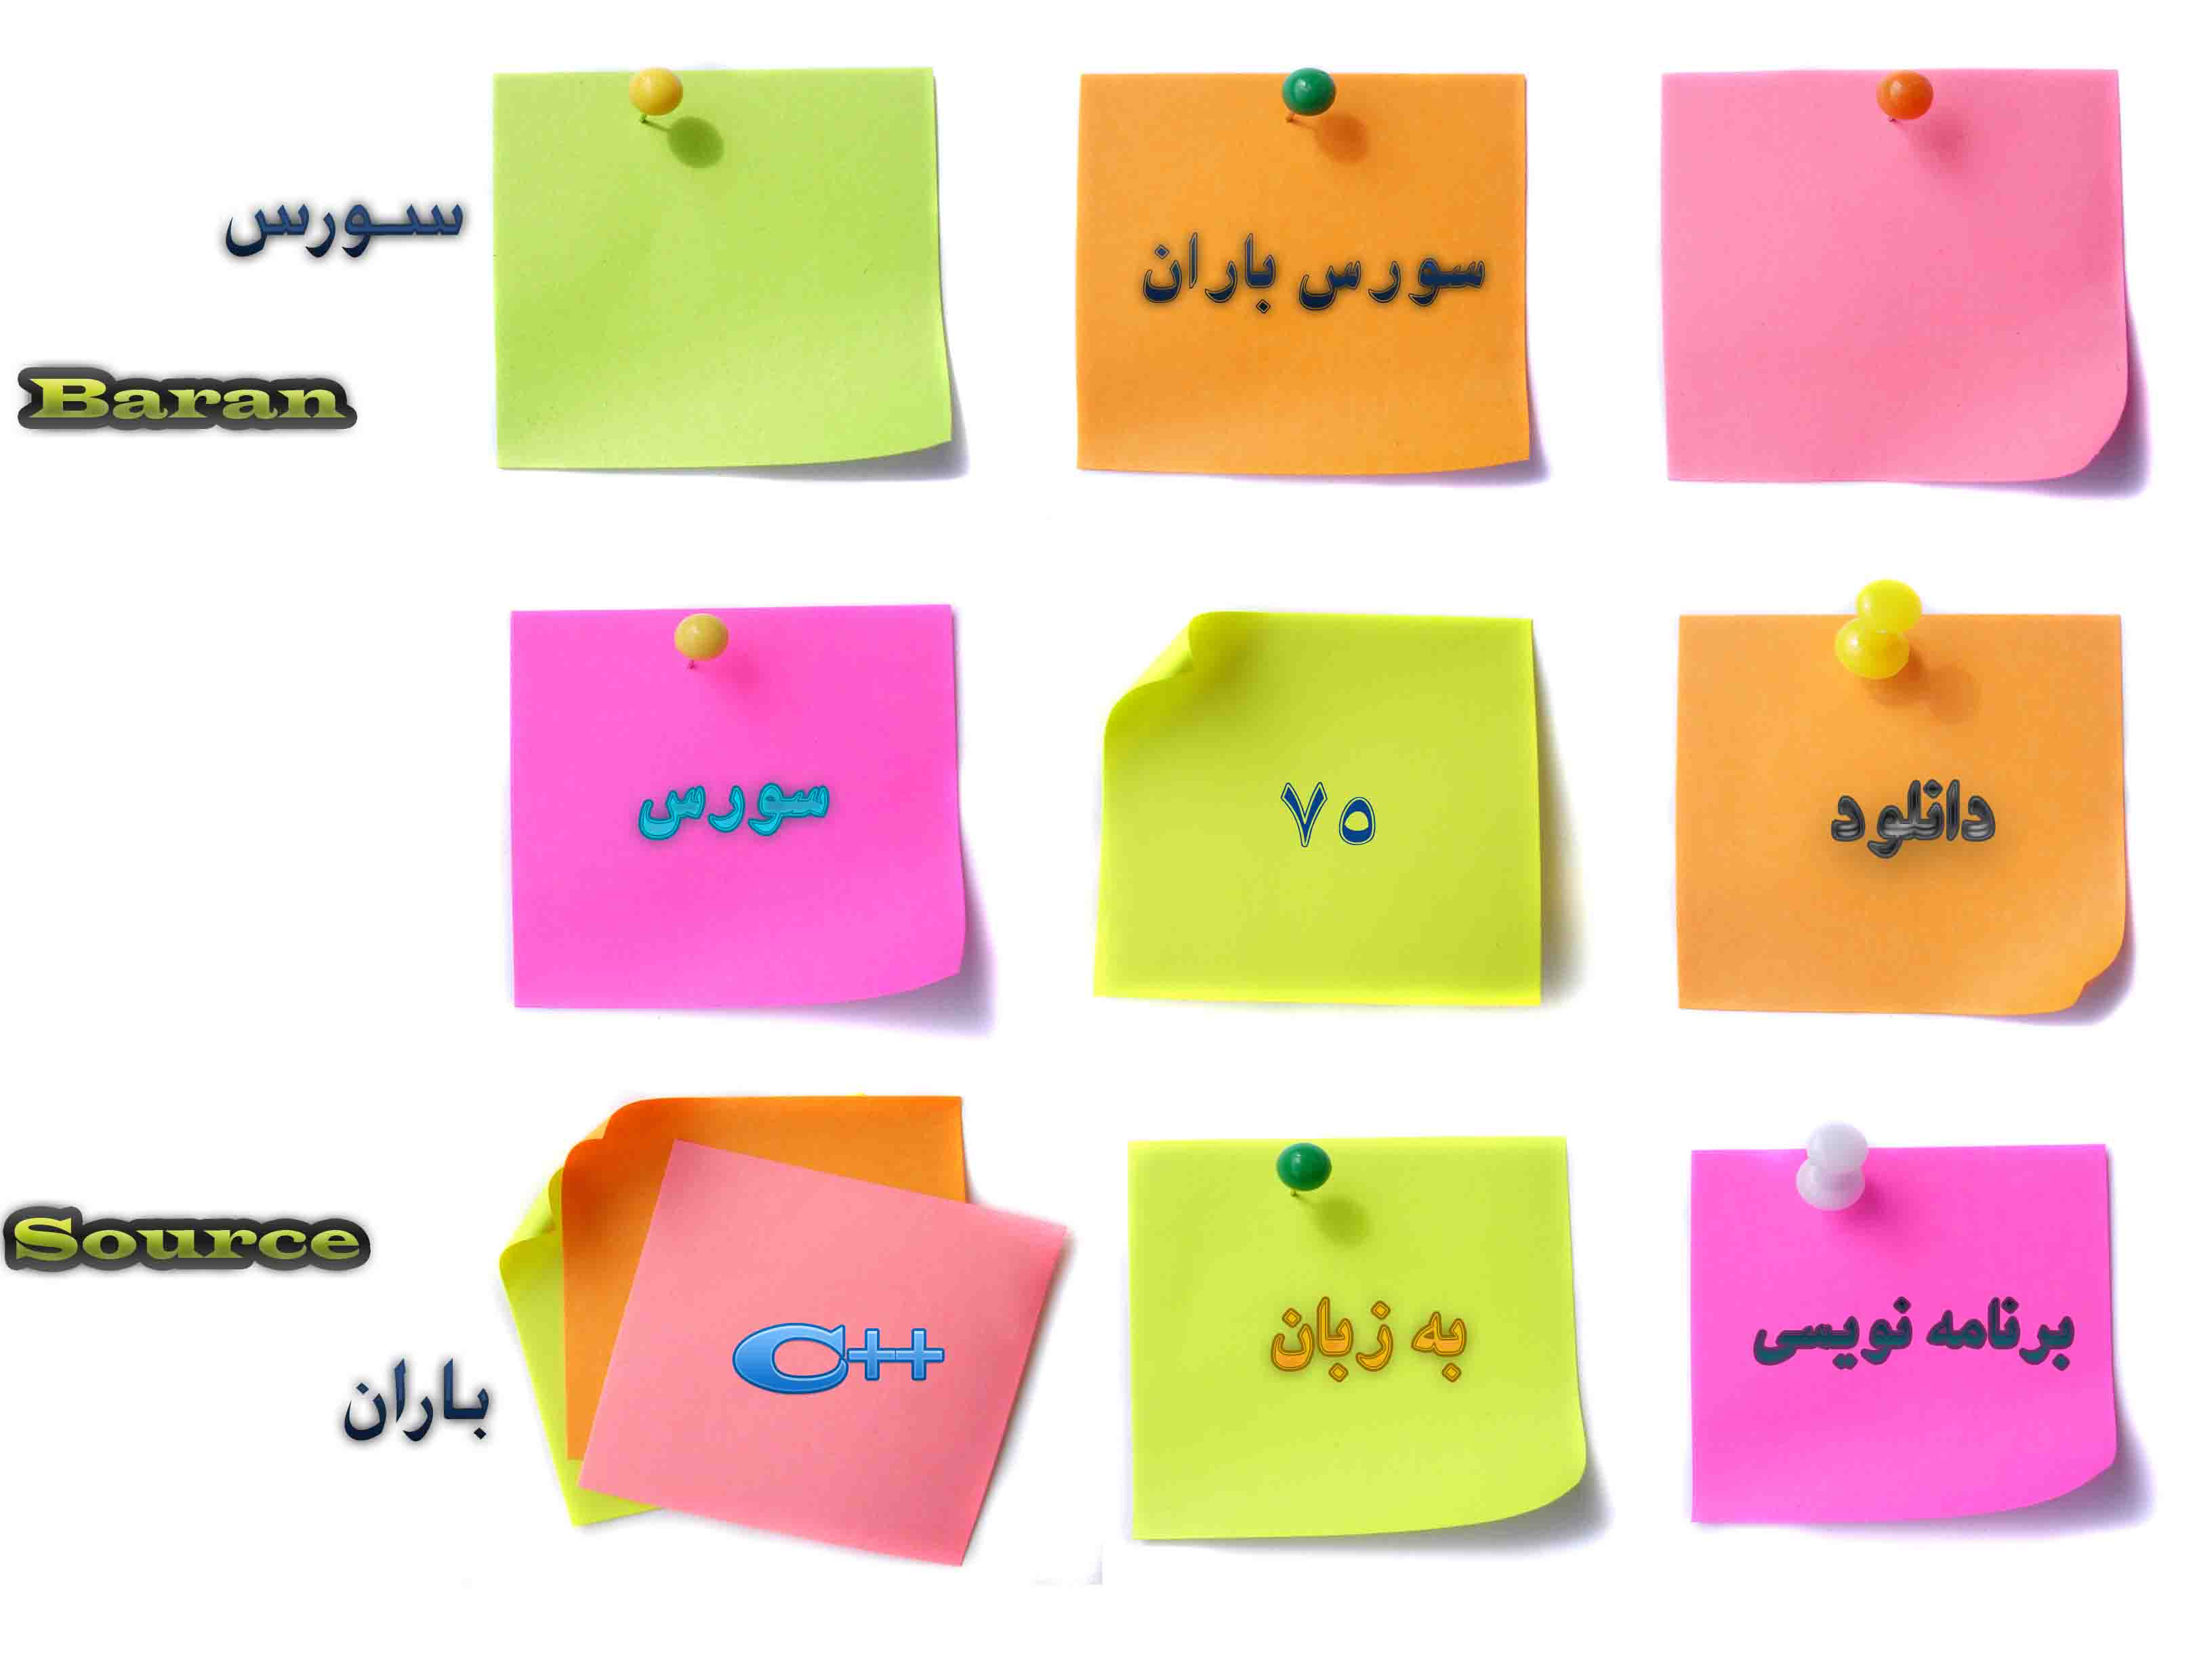 75 سورس کاربردی زبان سی پلاس پلاس